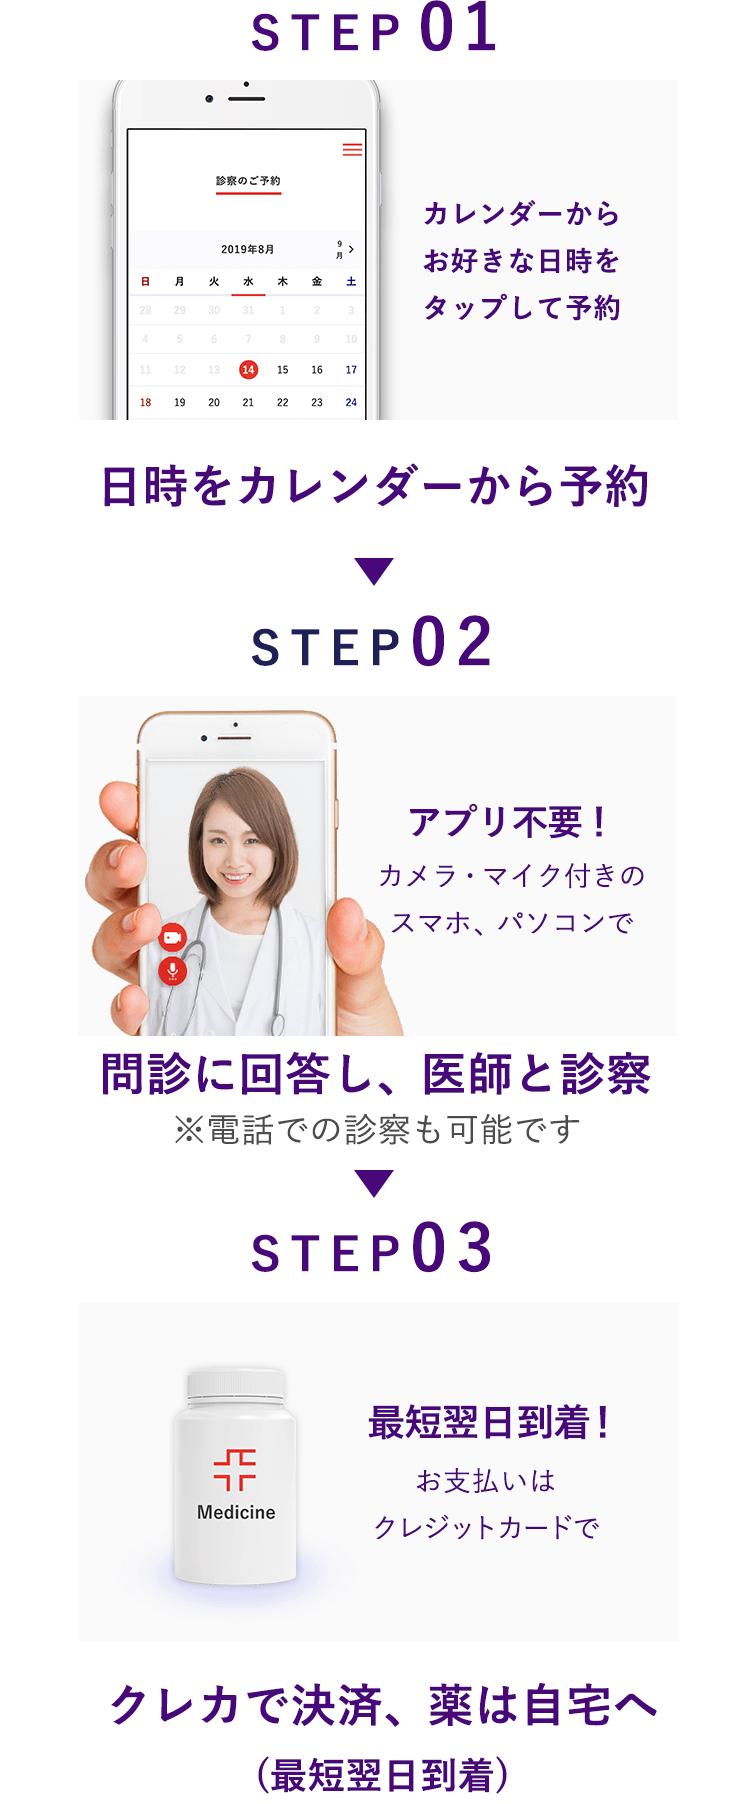 STEP01. 日時をカレンダーから予約   STEP02. 問診に回答し、医師と診察   STEP03. クレカで決済、薬は自宅へ